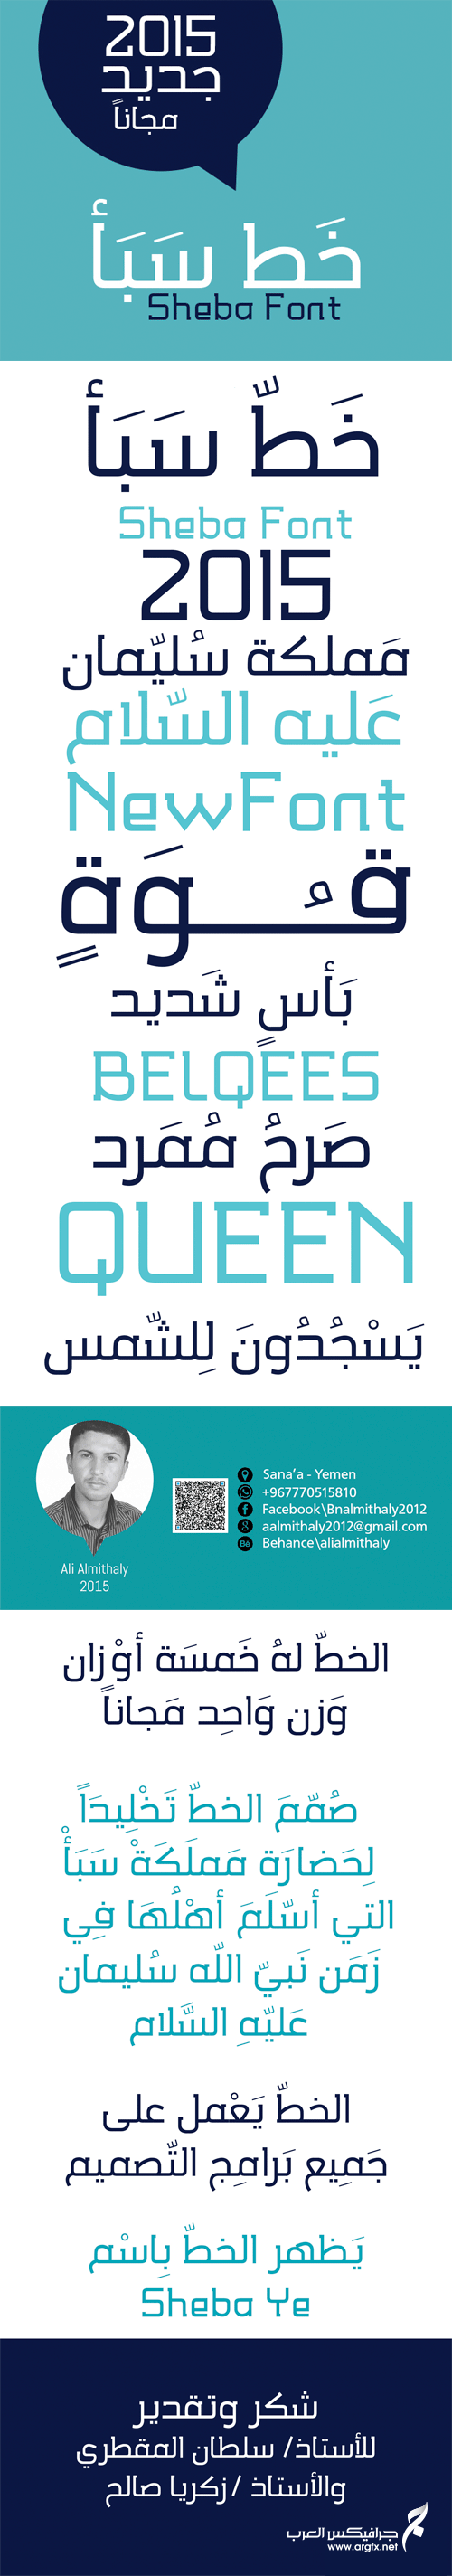 Sheba Font Arabic